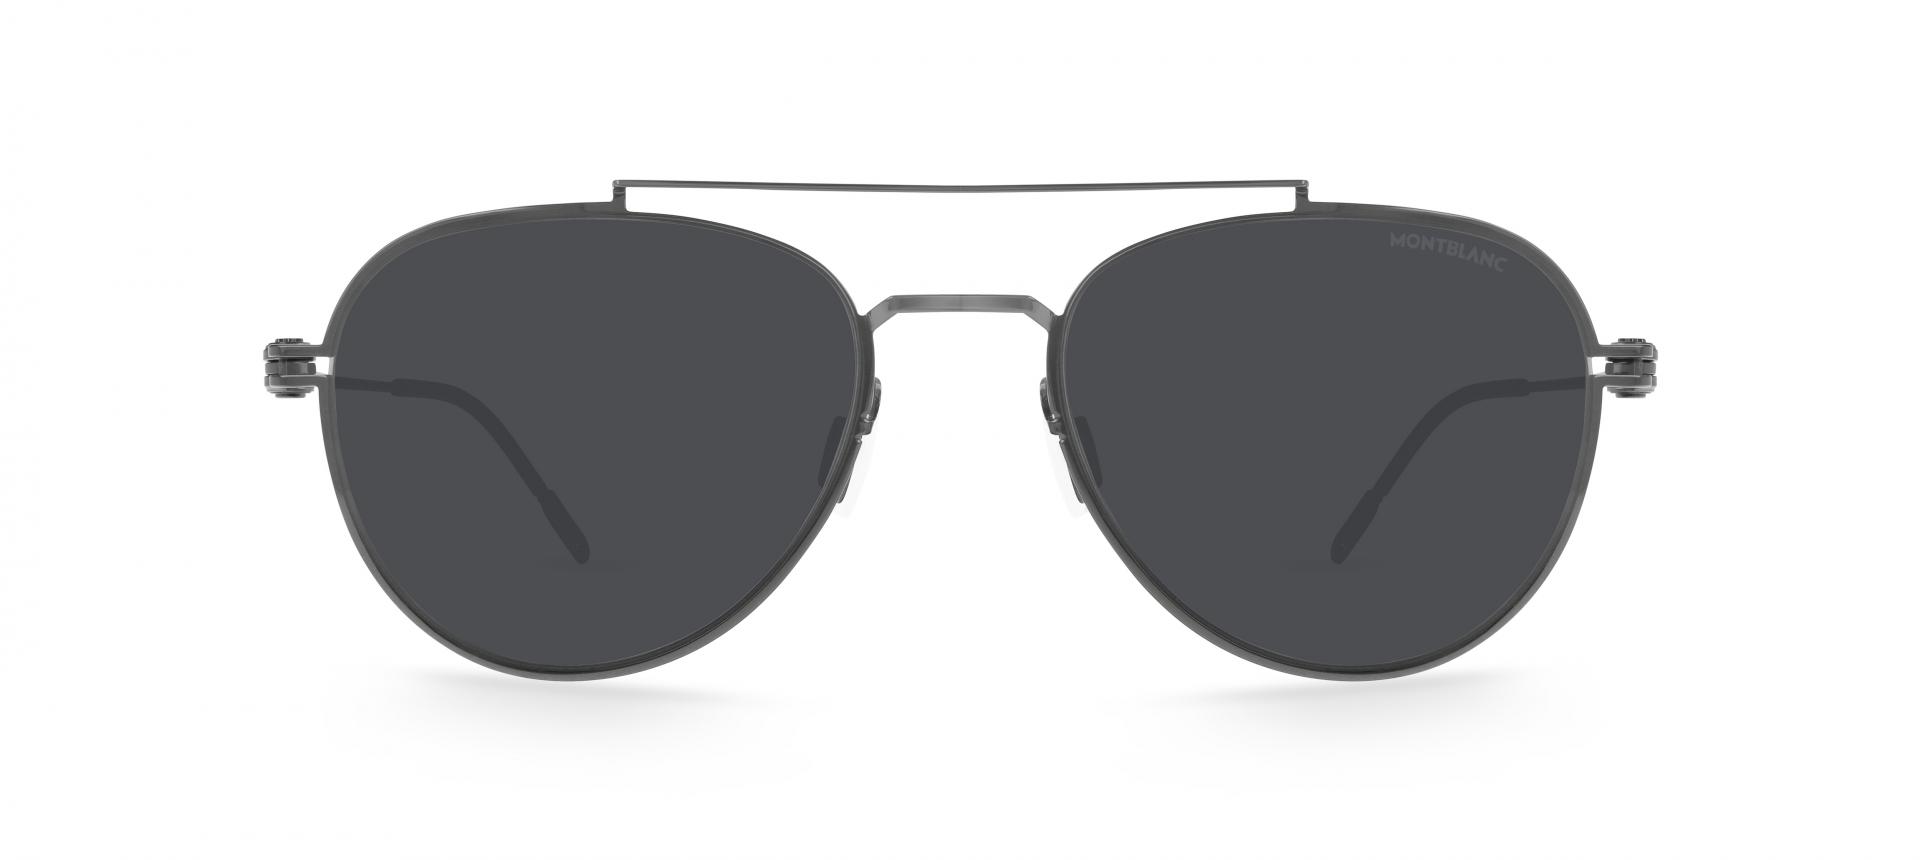 0ffce2864dc Kering Eyewear - Home